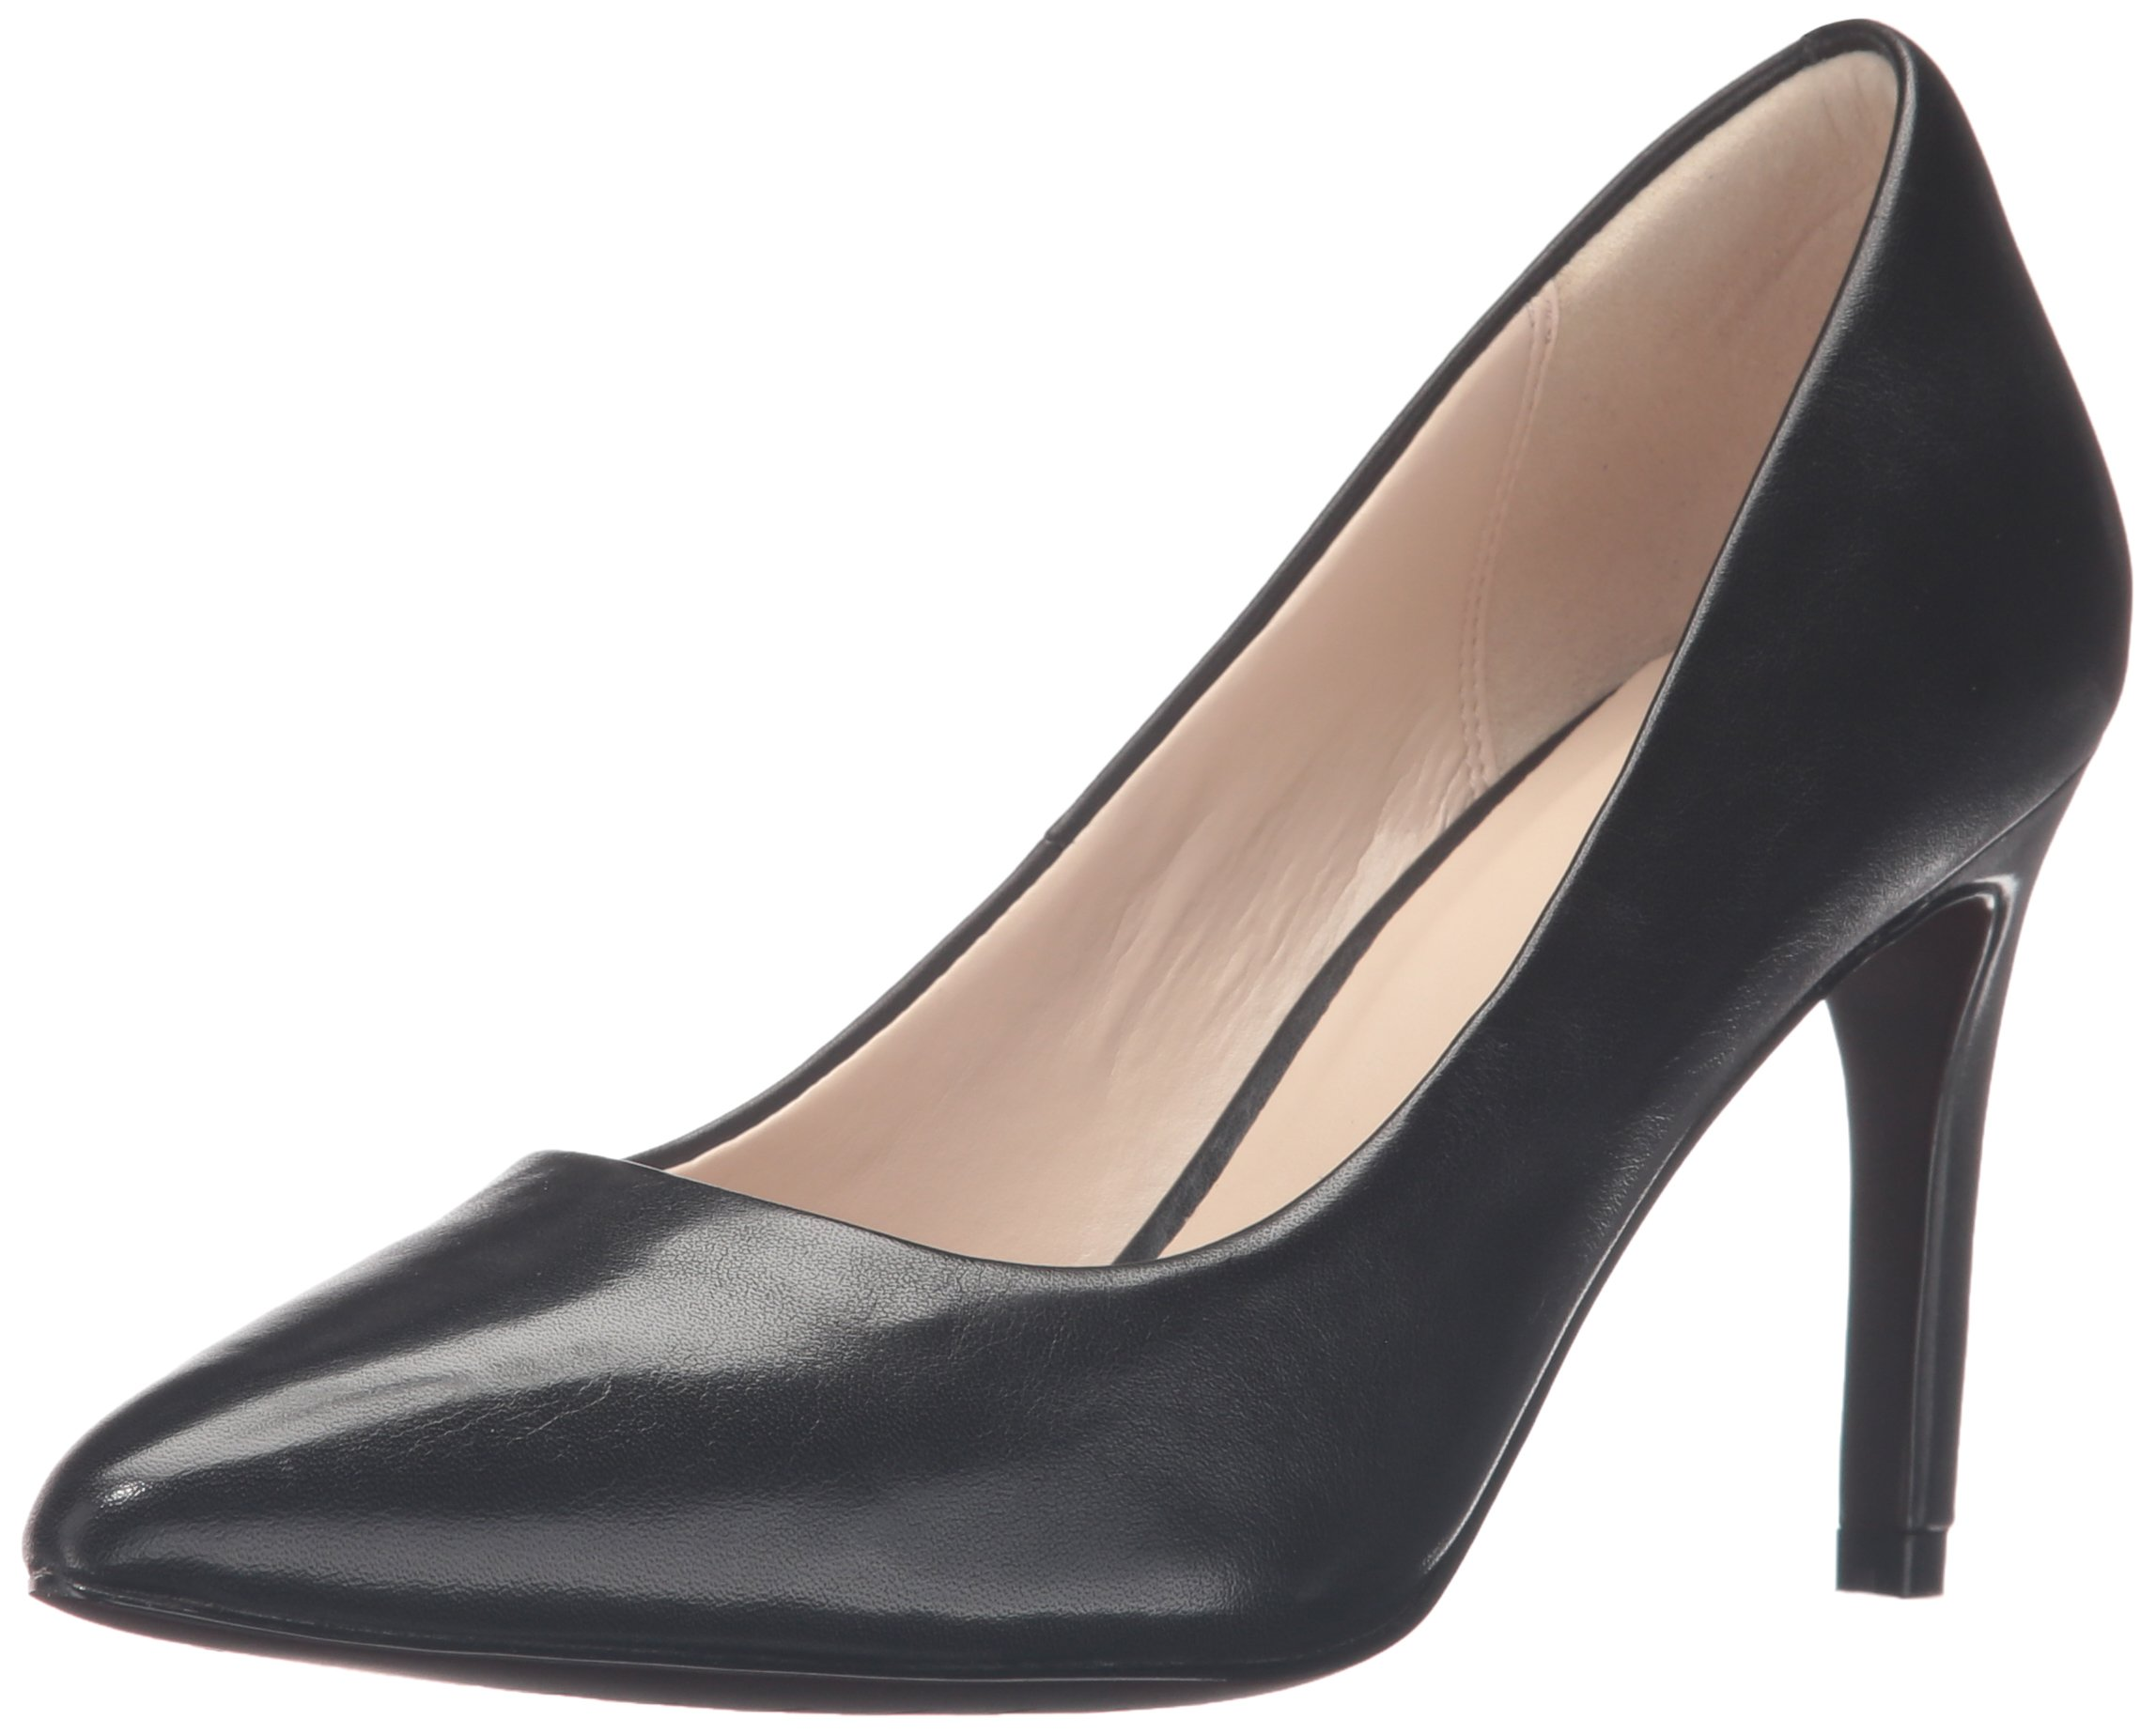 Cole Haan Women's Amelia Grand 85mm Dress Pump, Black Leather, 7.5 B US